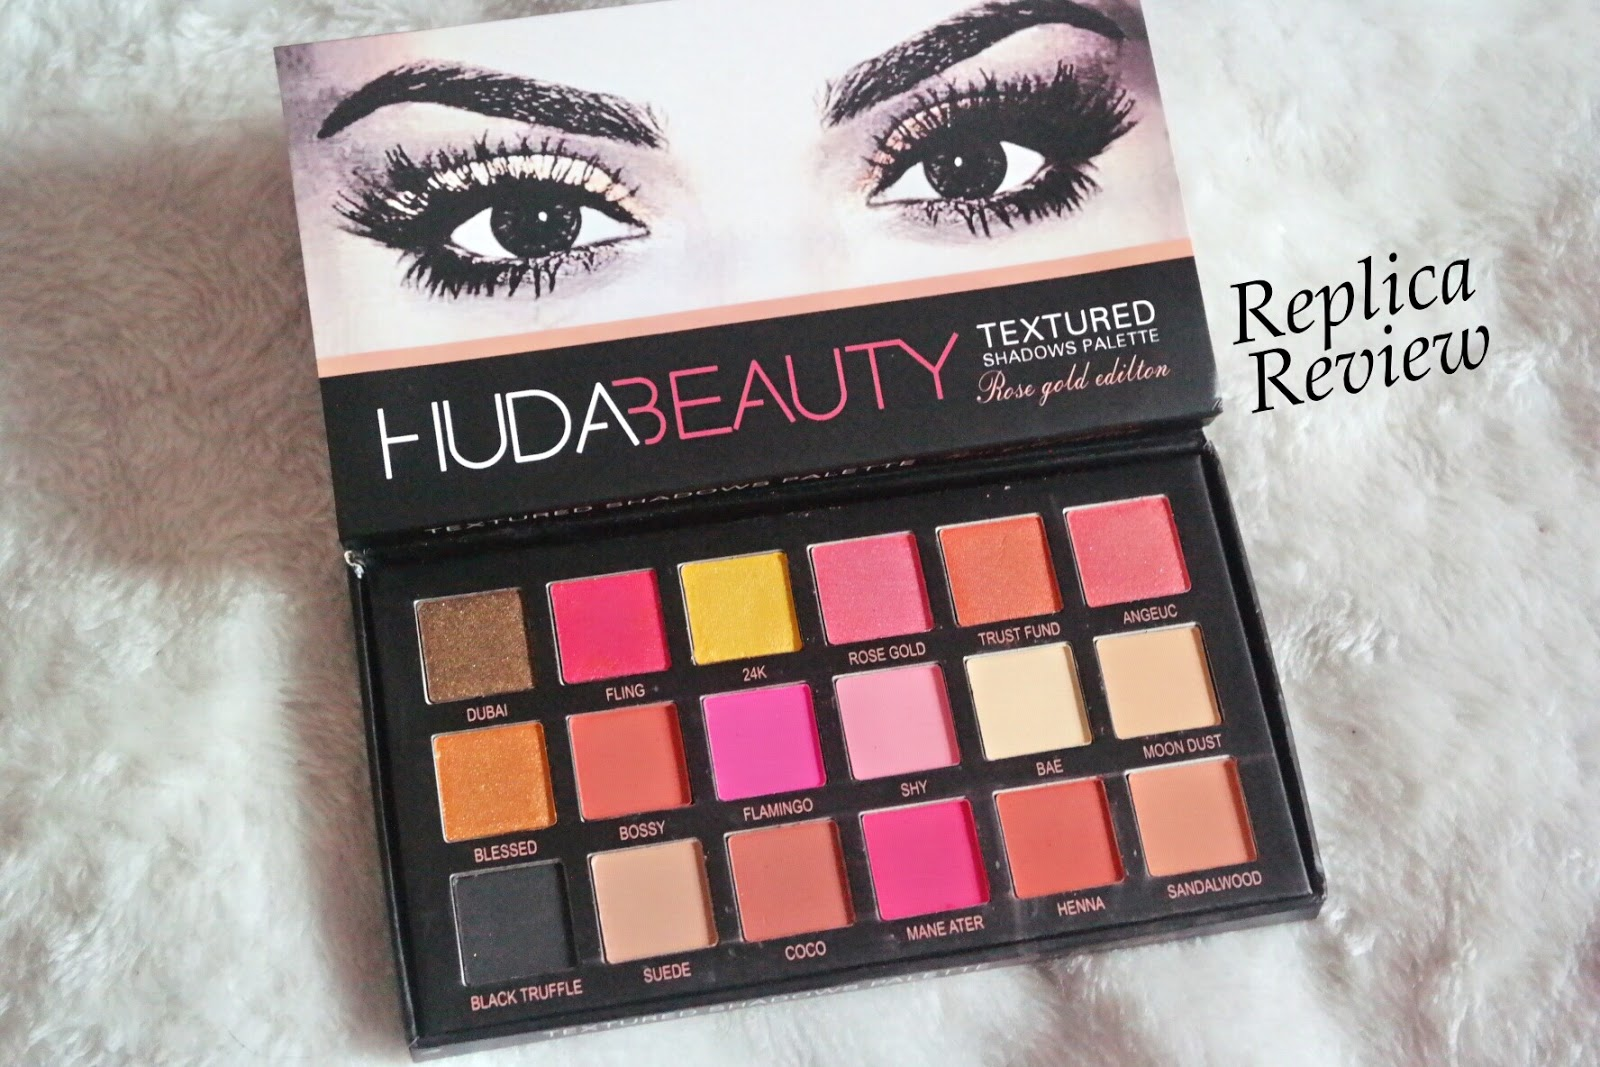 Curly Hair Fashion Beauty Huda Beauty Textured Shadows Palette